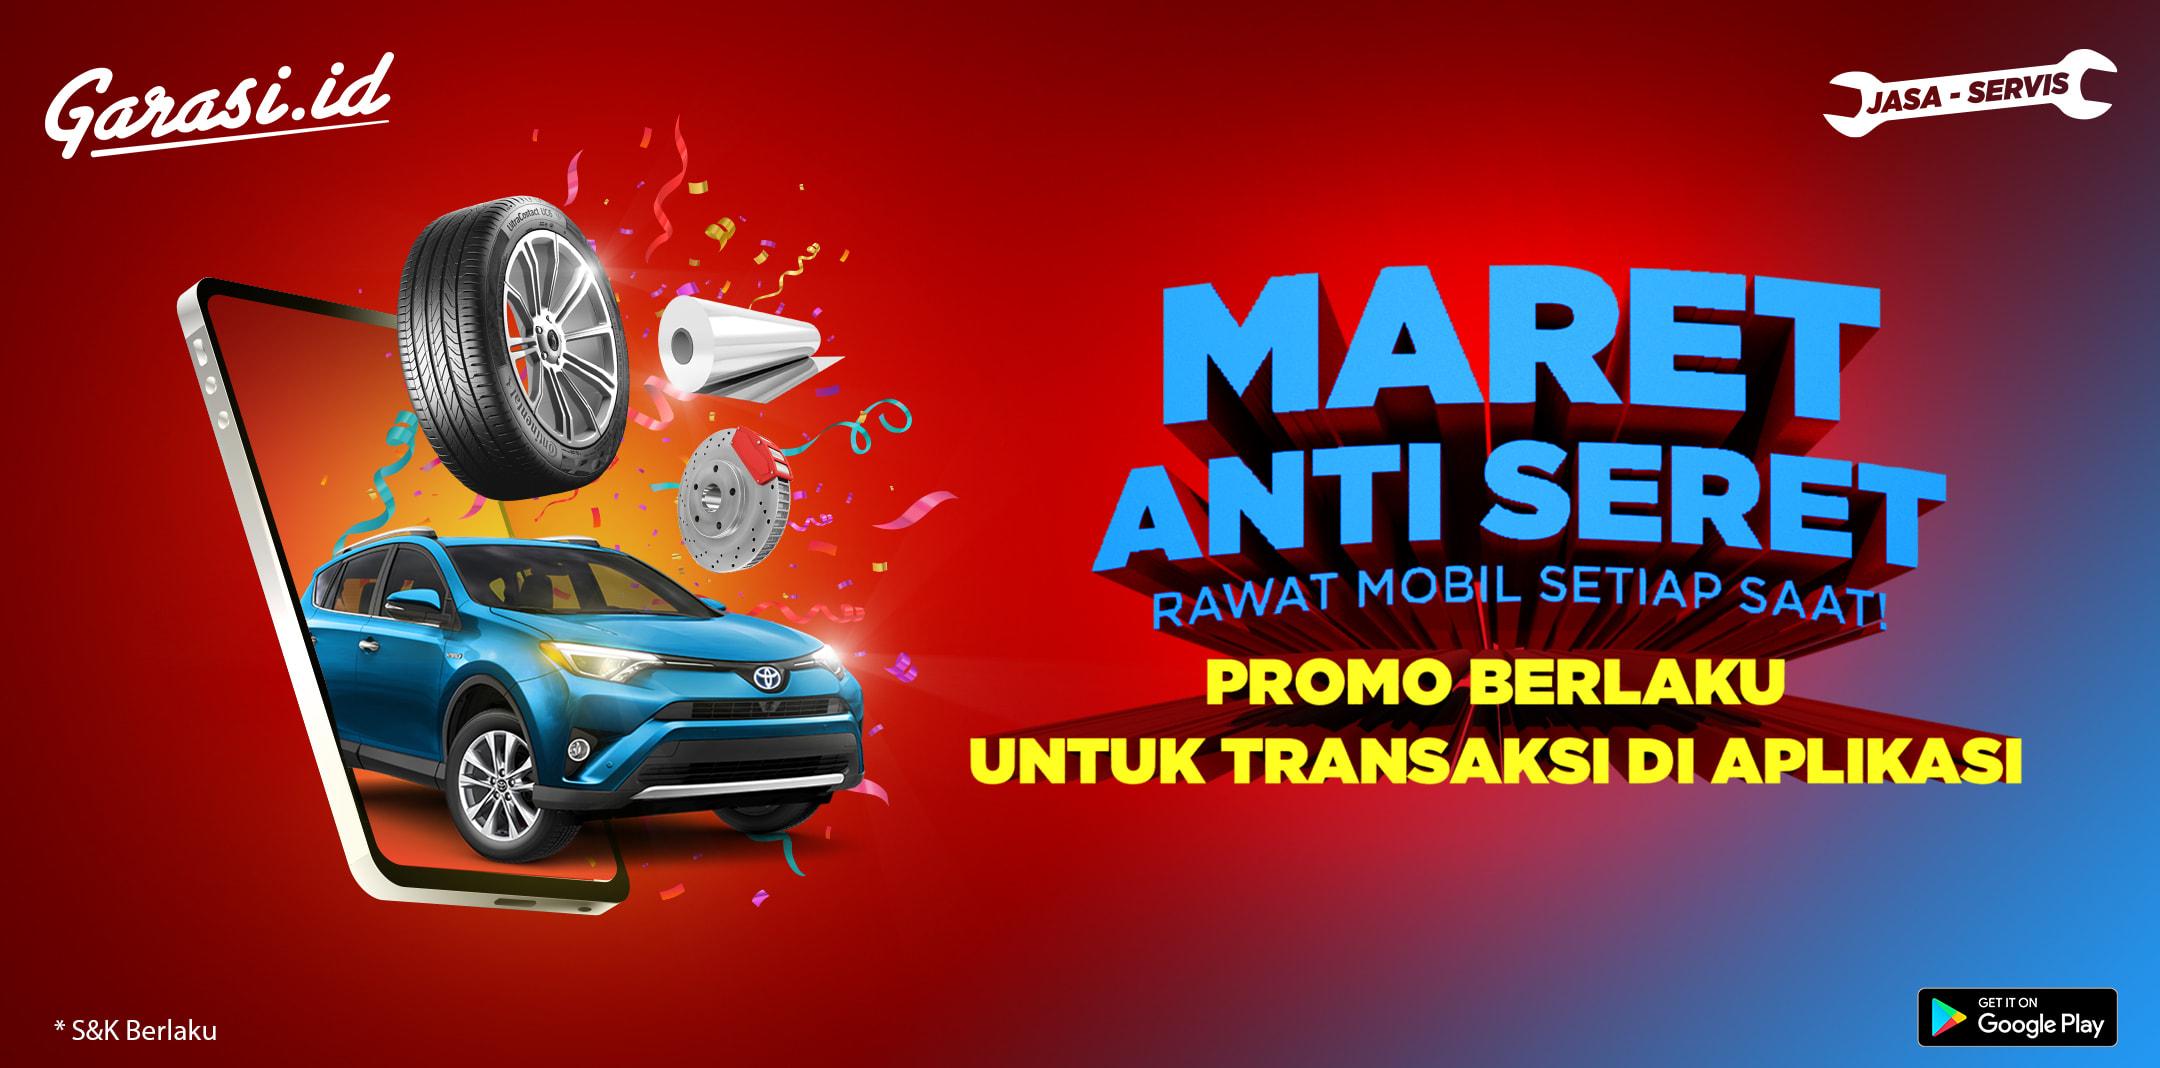 Dapatkan Diskon 20% hingga Rp 50 ribu untuk SEMUA produk Perawatan Mobil di Jasa dan Servis Garasi.id!